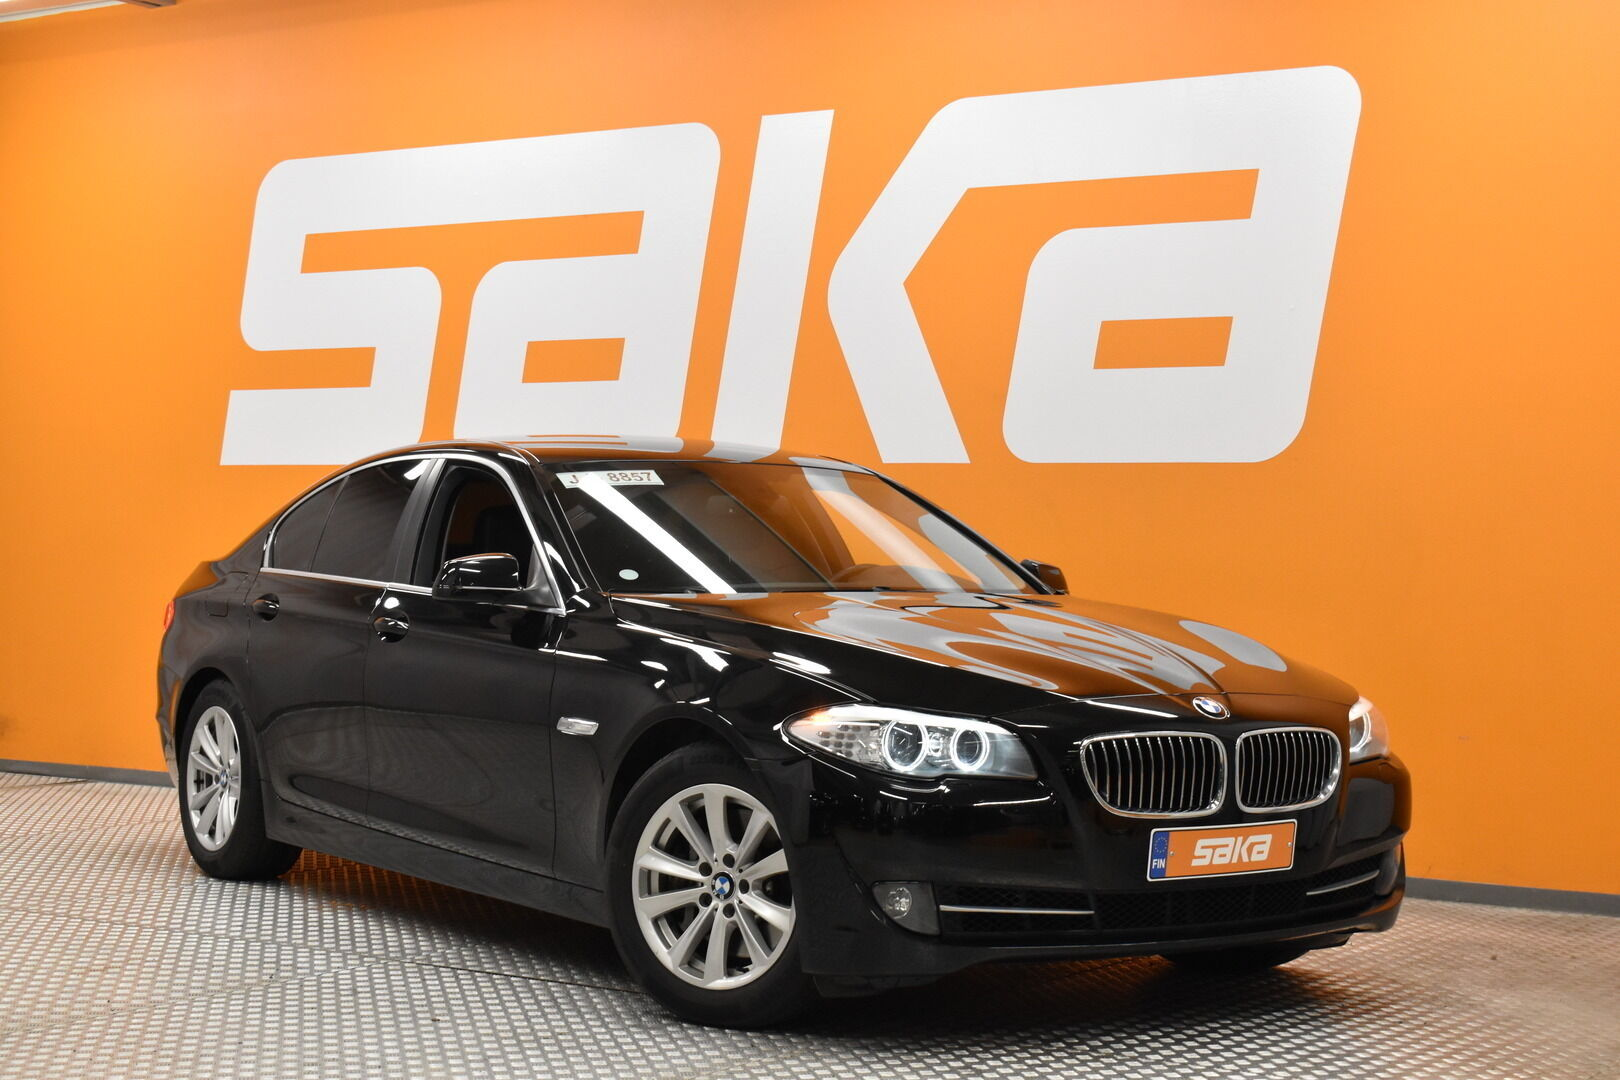 Musta Sedan, BMW 528 – POR-8128, kuva 1